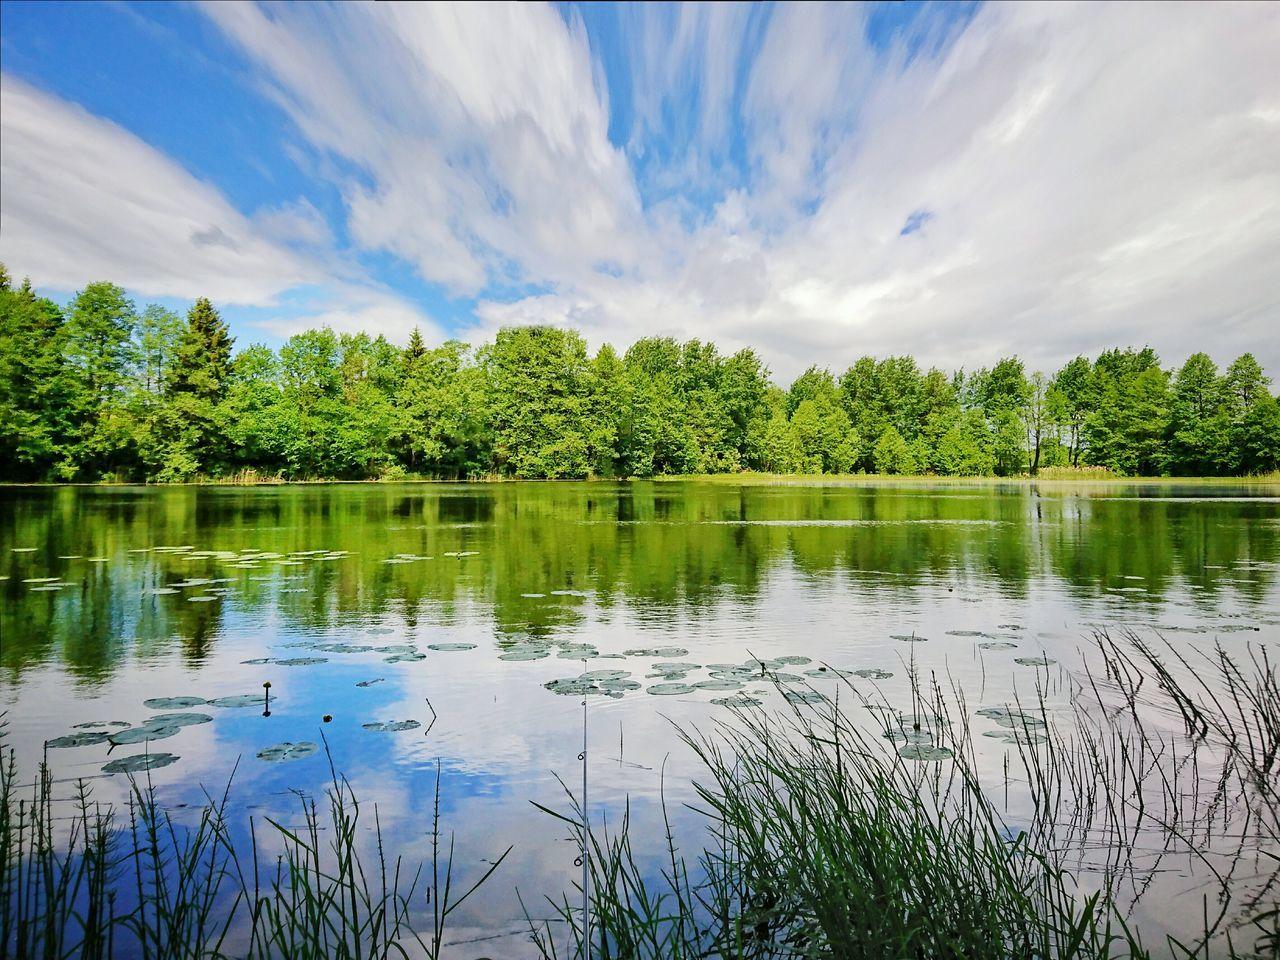 Reflection Lake Water Cloud - Sky Sky Nature Scenics Outdoors Tree Day No People Beauty In Nature Plant Polska Poland Xperiaxz Warmia